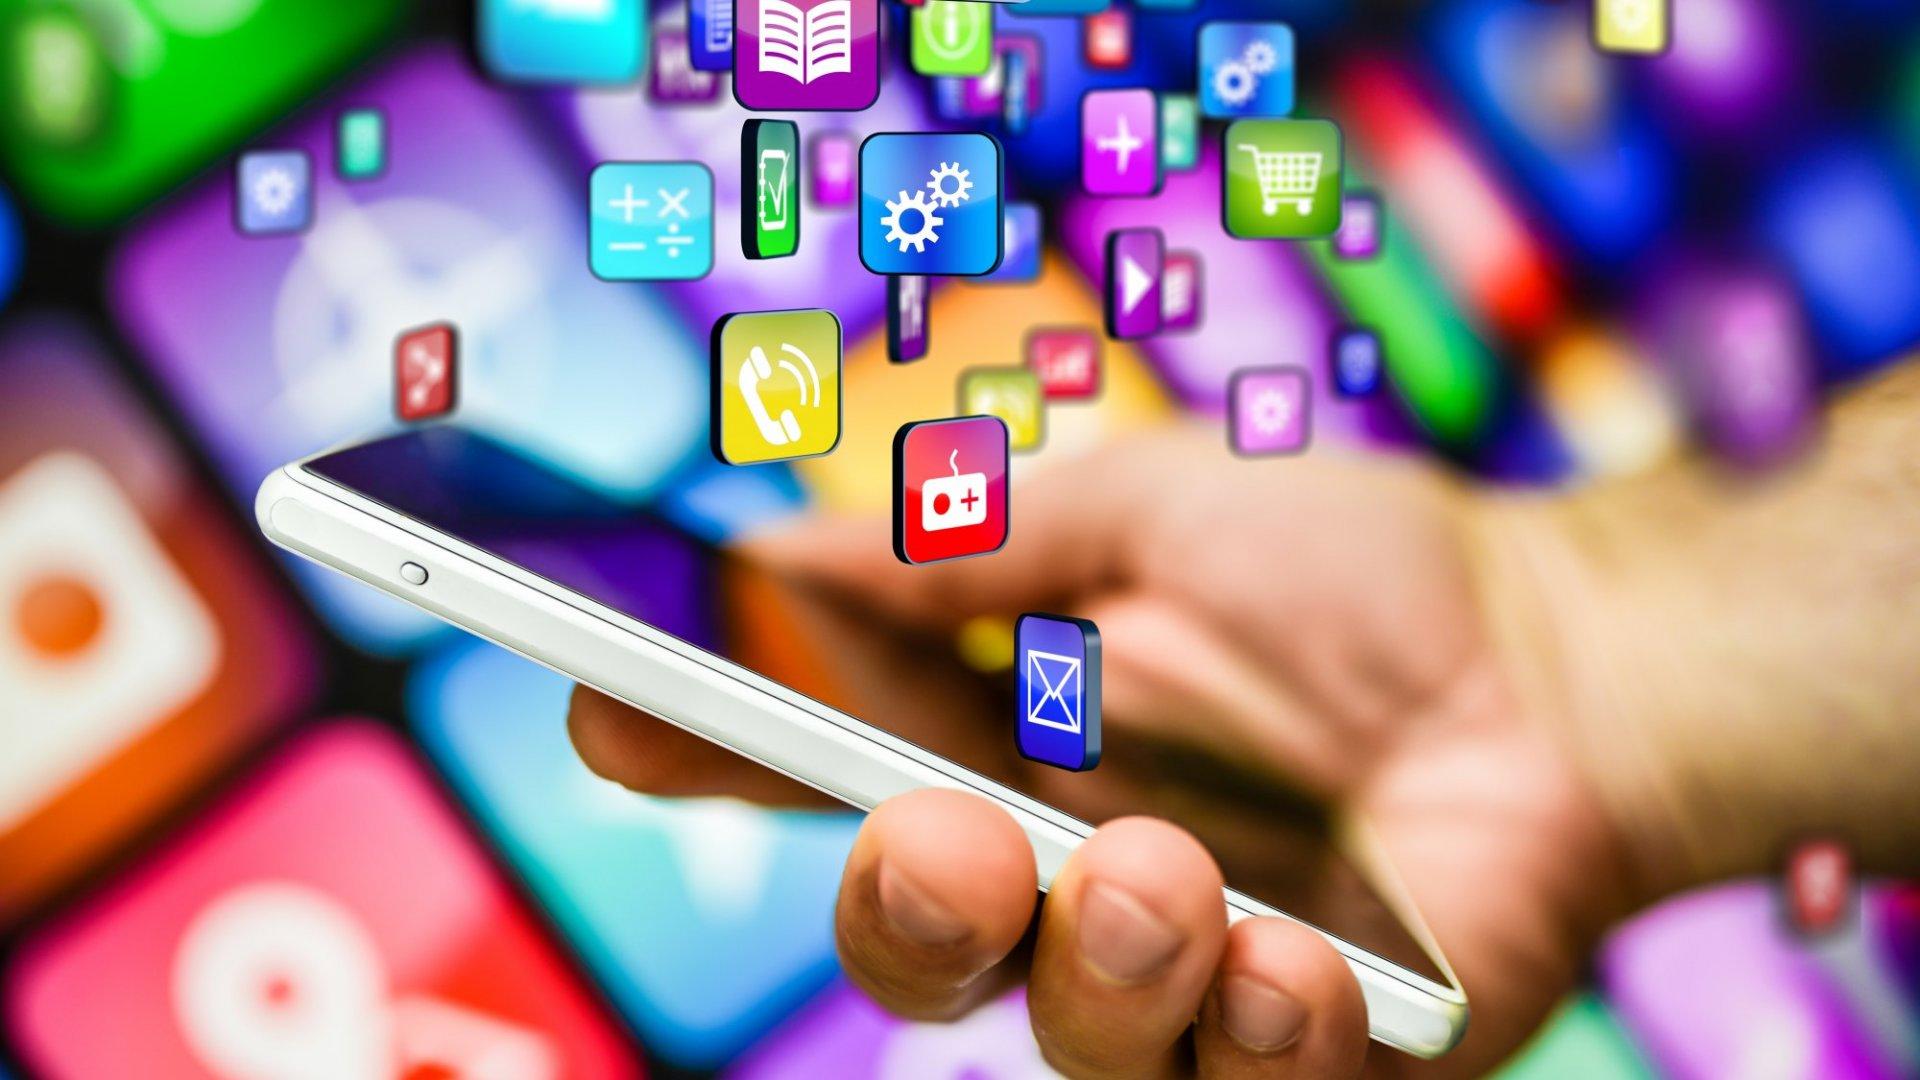 Original Iphone Developer Explains Why You Should Shut Down Your Background Apps Inc Com